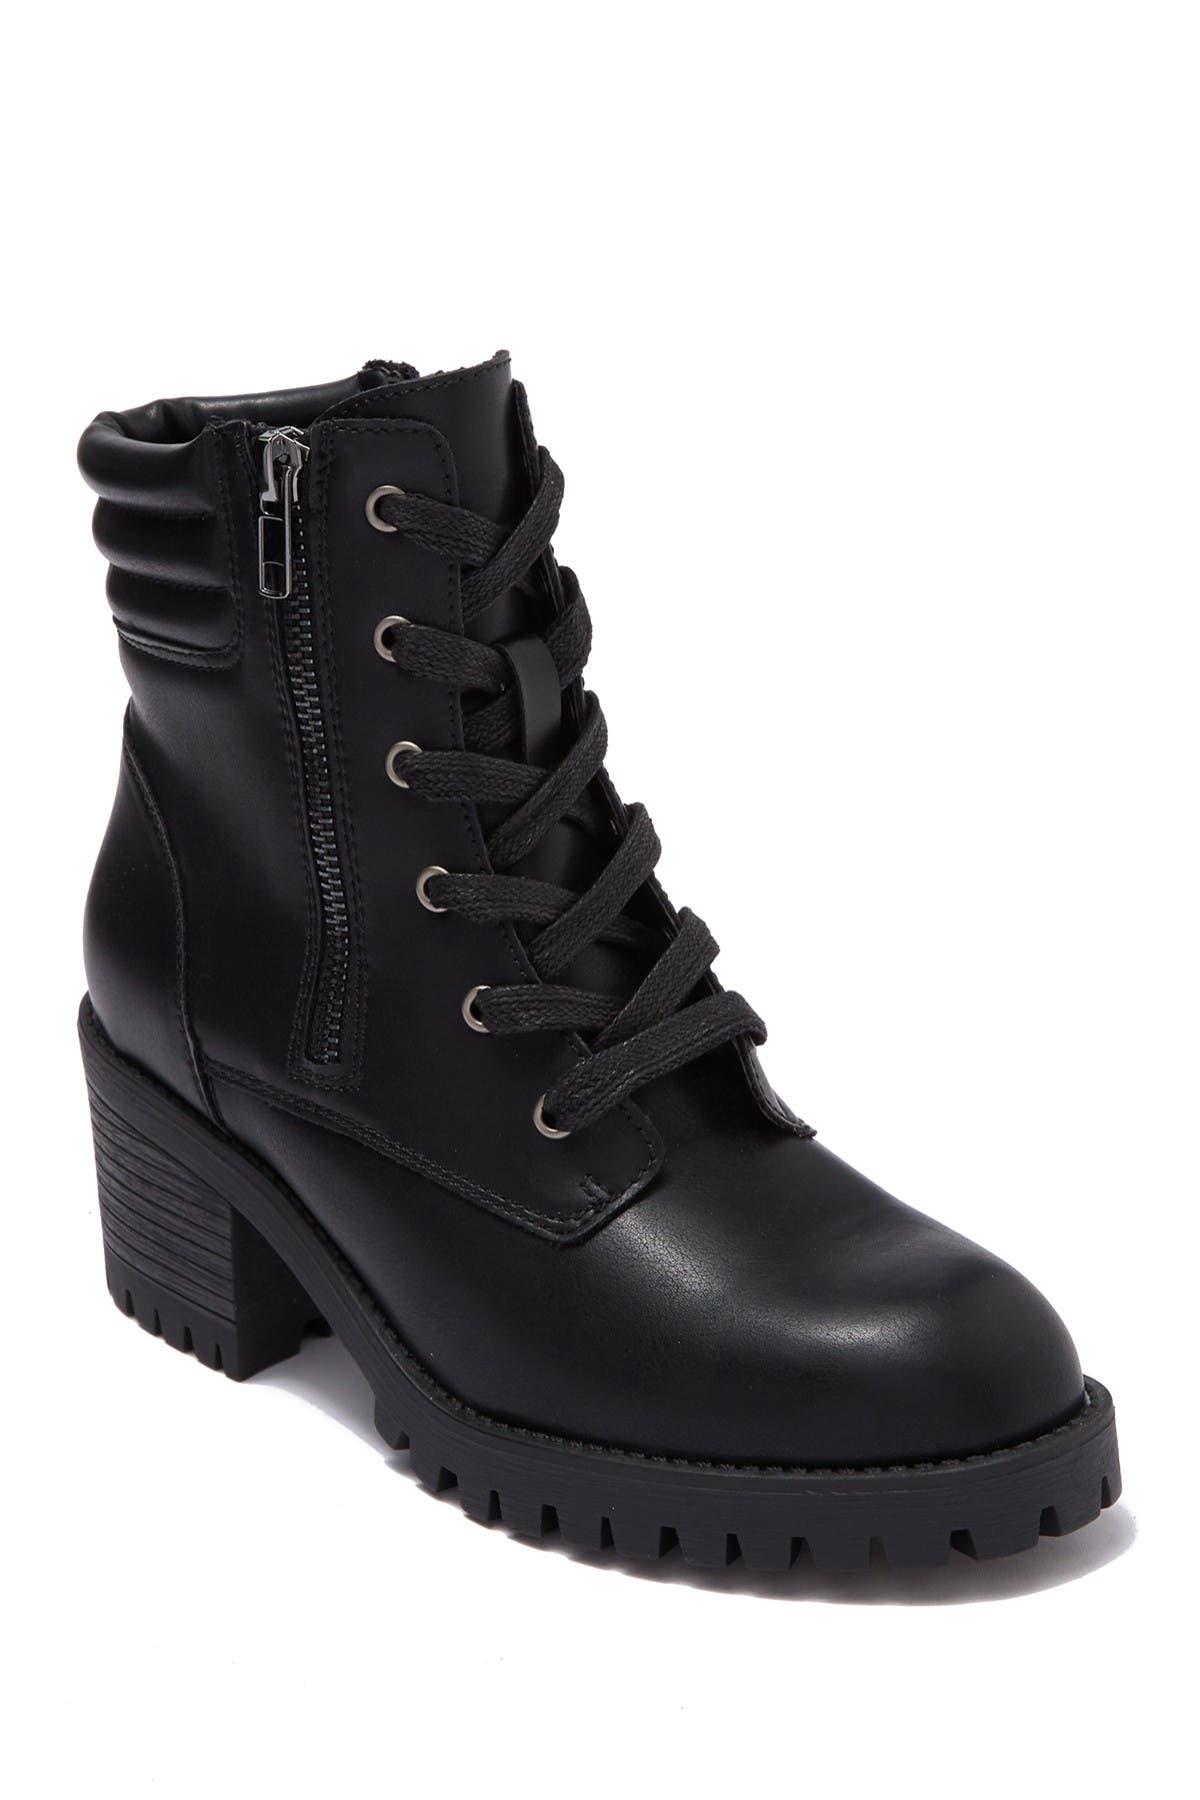 Image of Madden Girl Hushh Lug Sole Boot